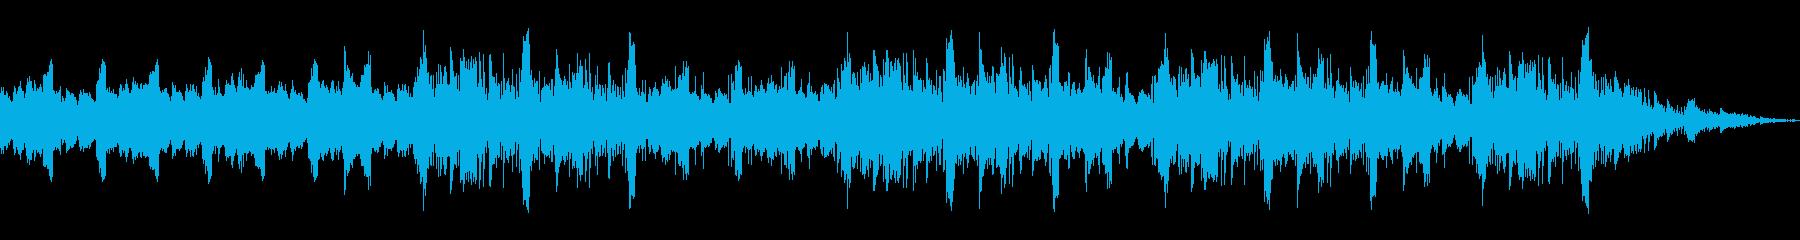 Saxophone Trap Beatの再生済みの波形